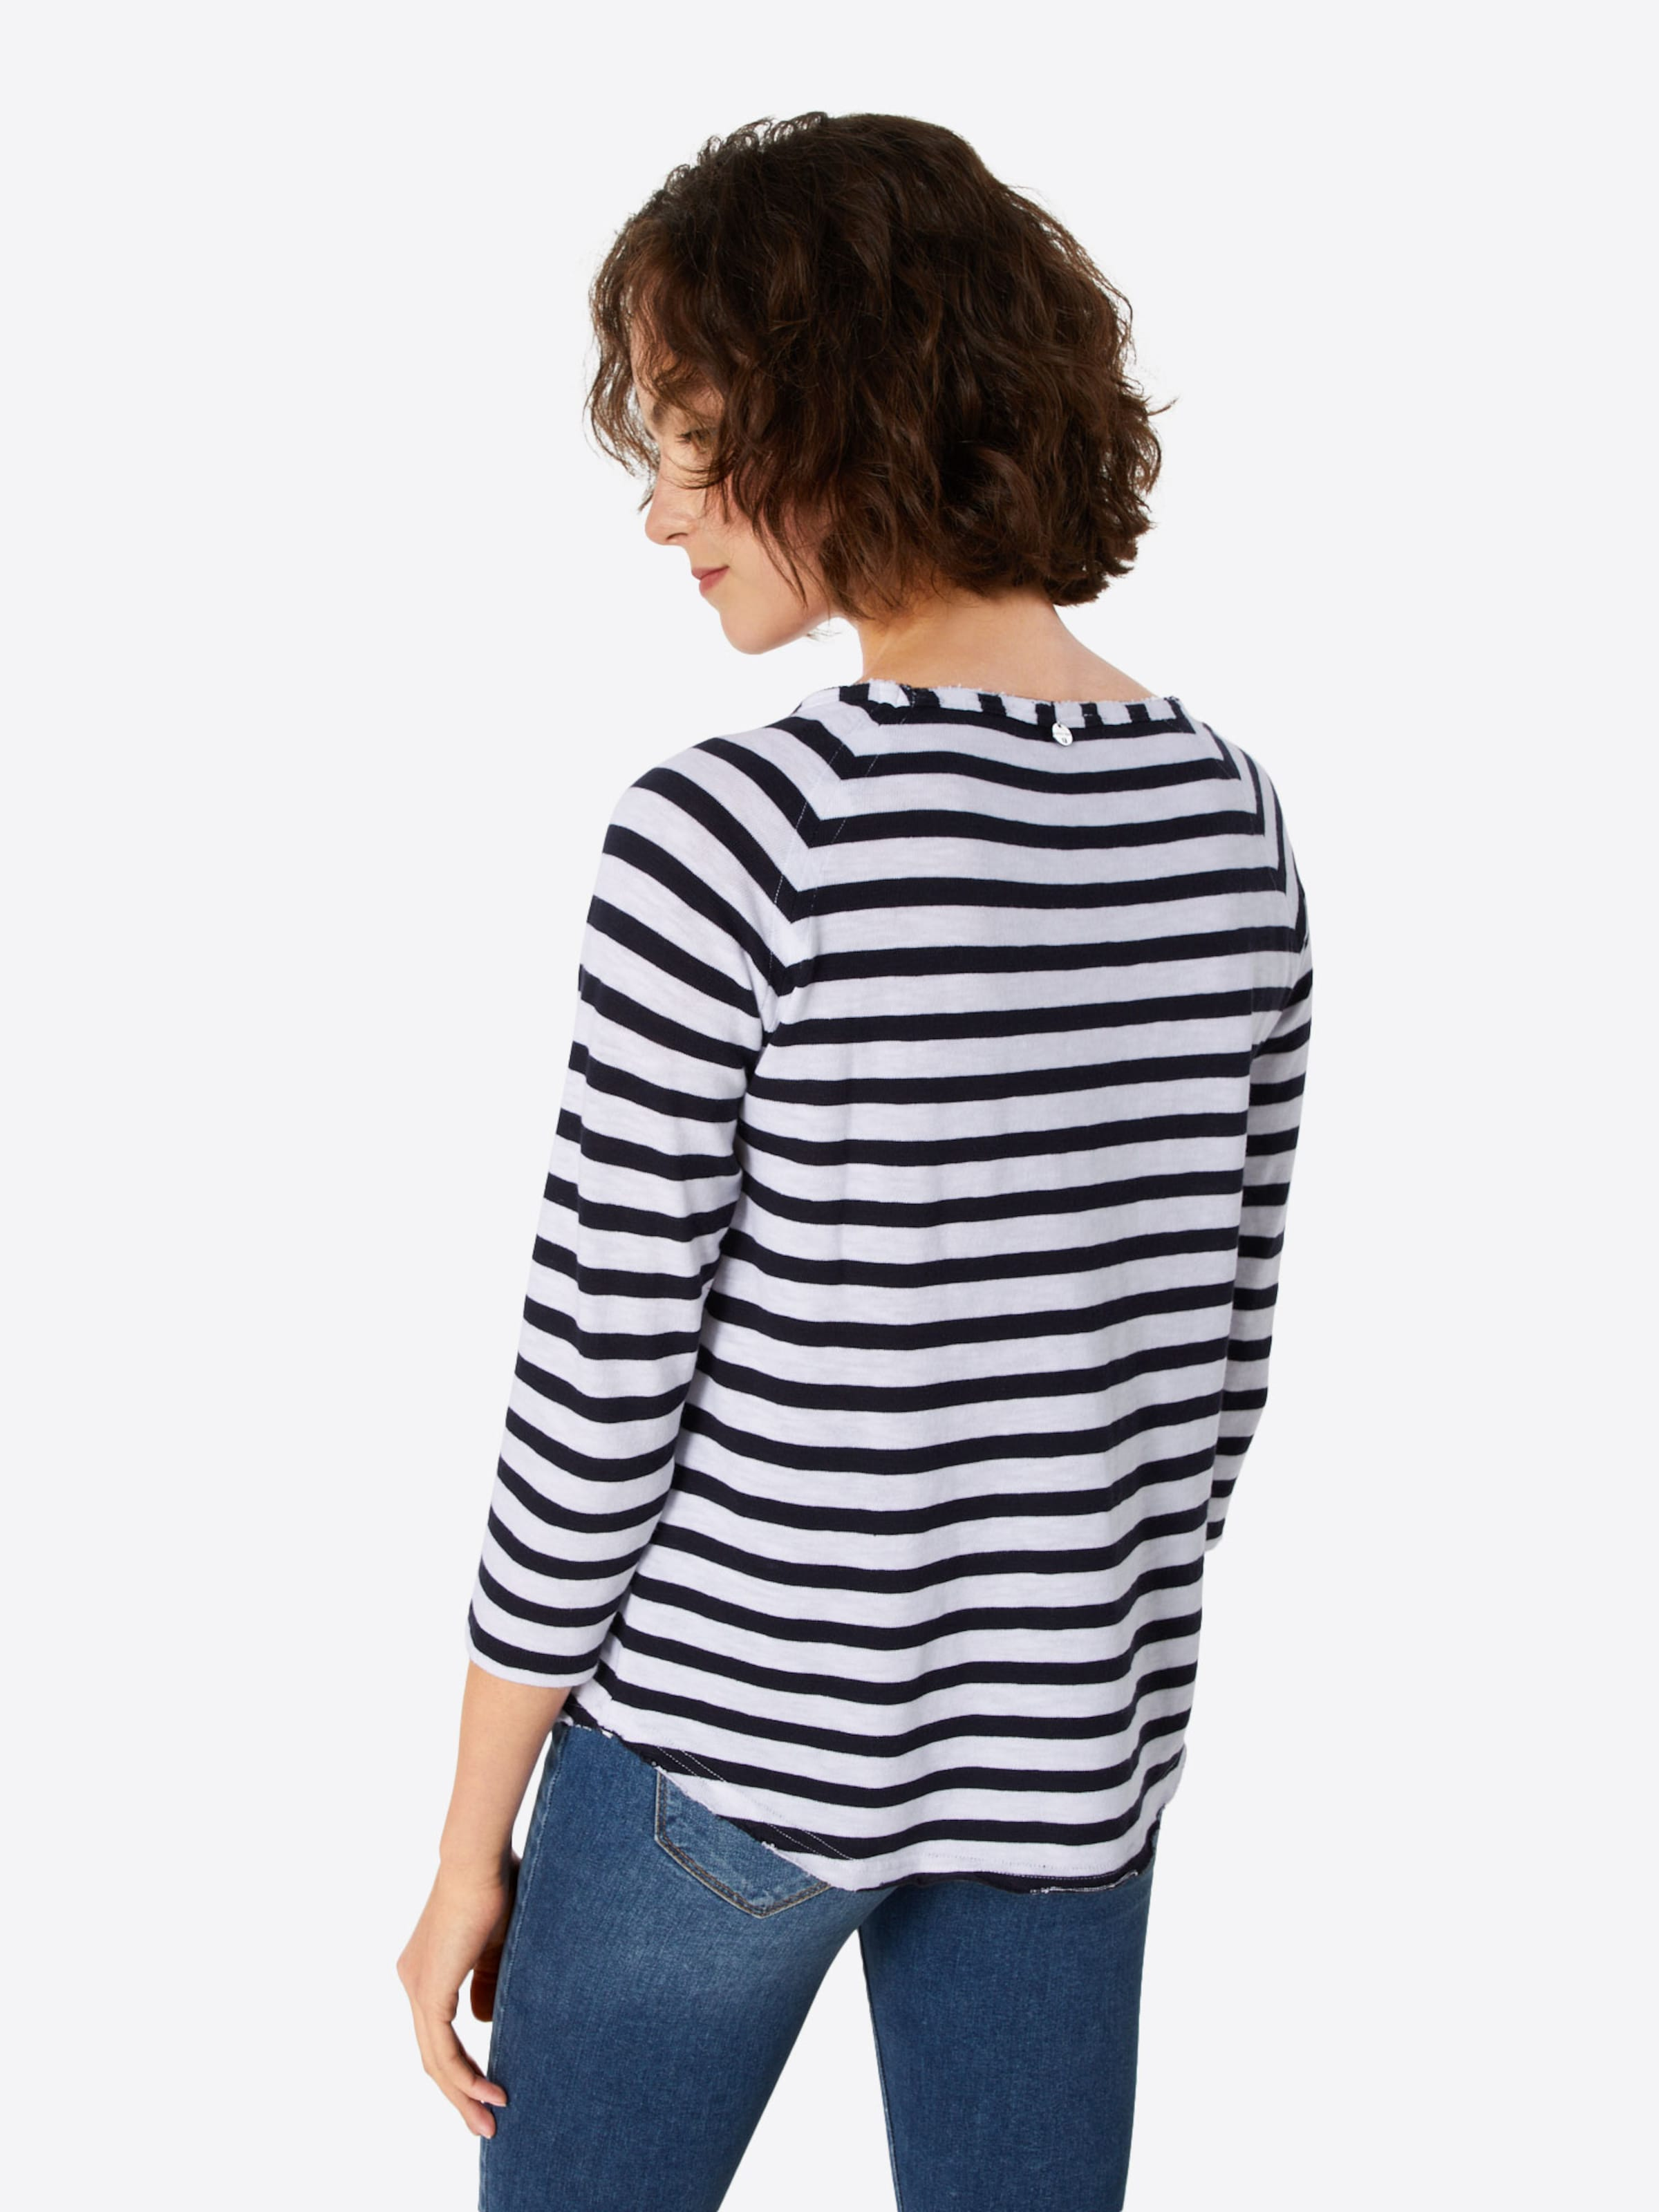 En BleuBlanc Longsleeve Striped' Richamp; shirt 'heavy Royal T Jersey 54jLARc3q